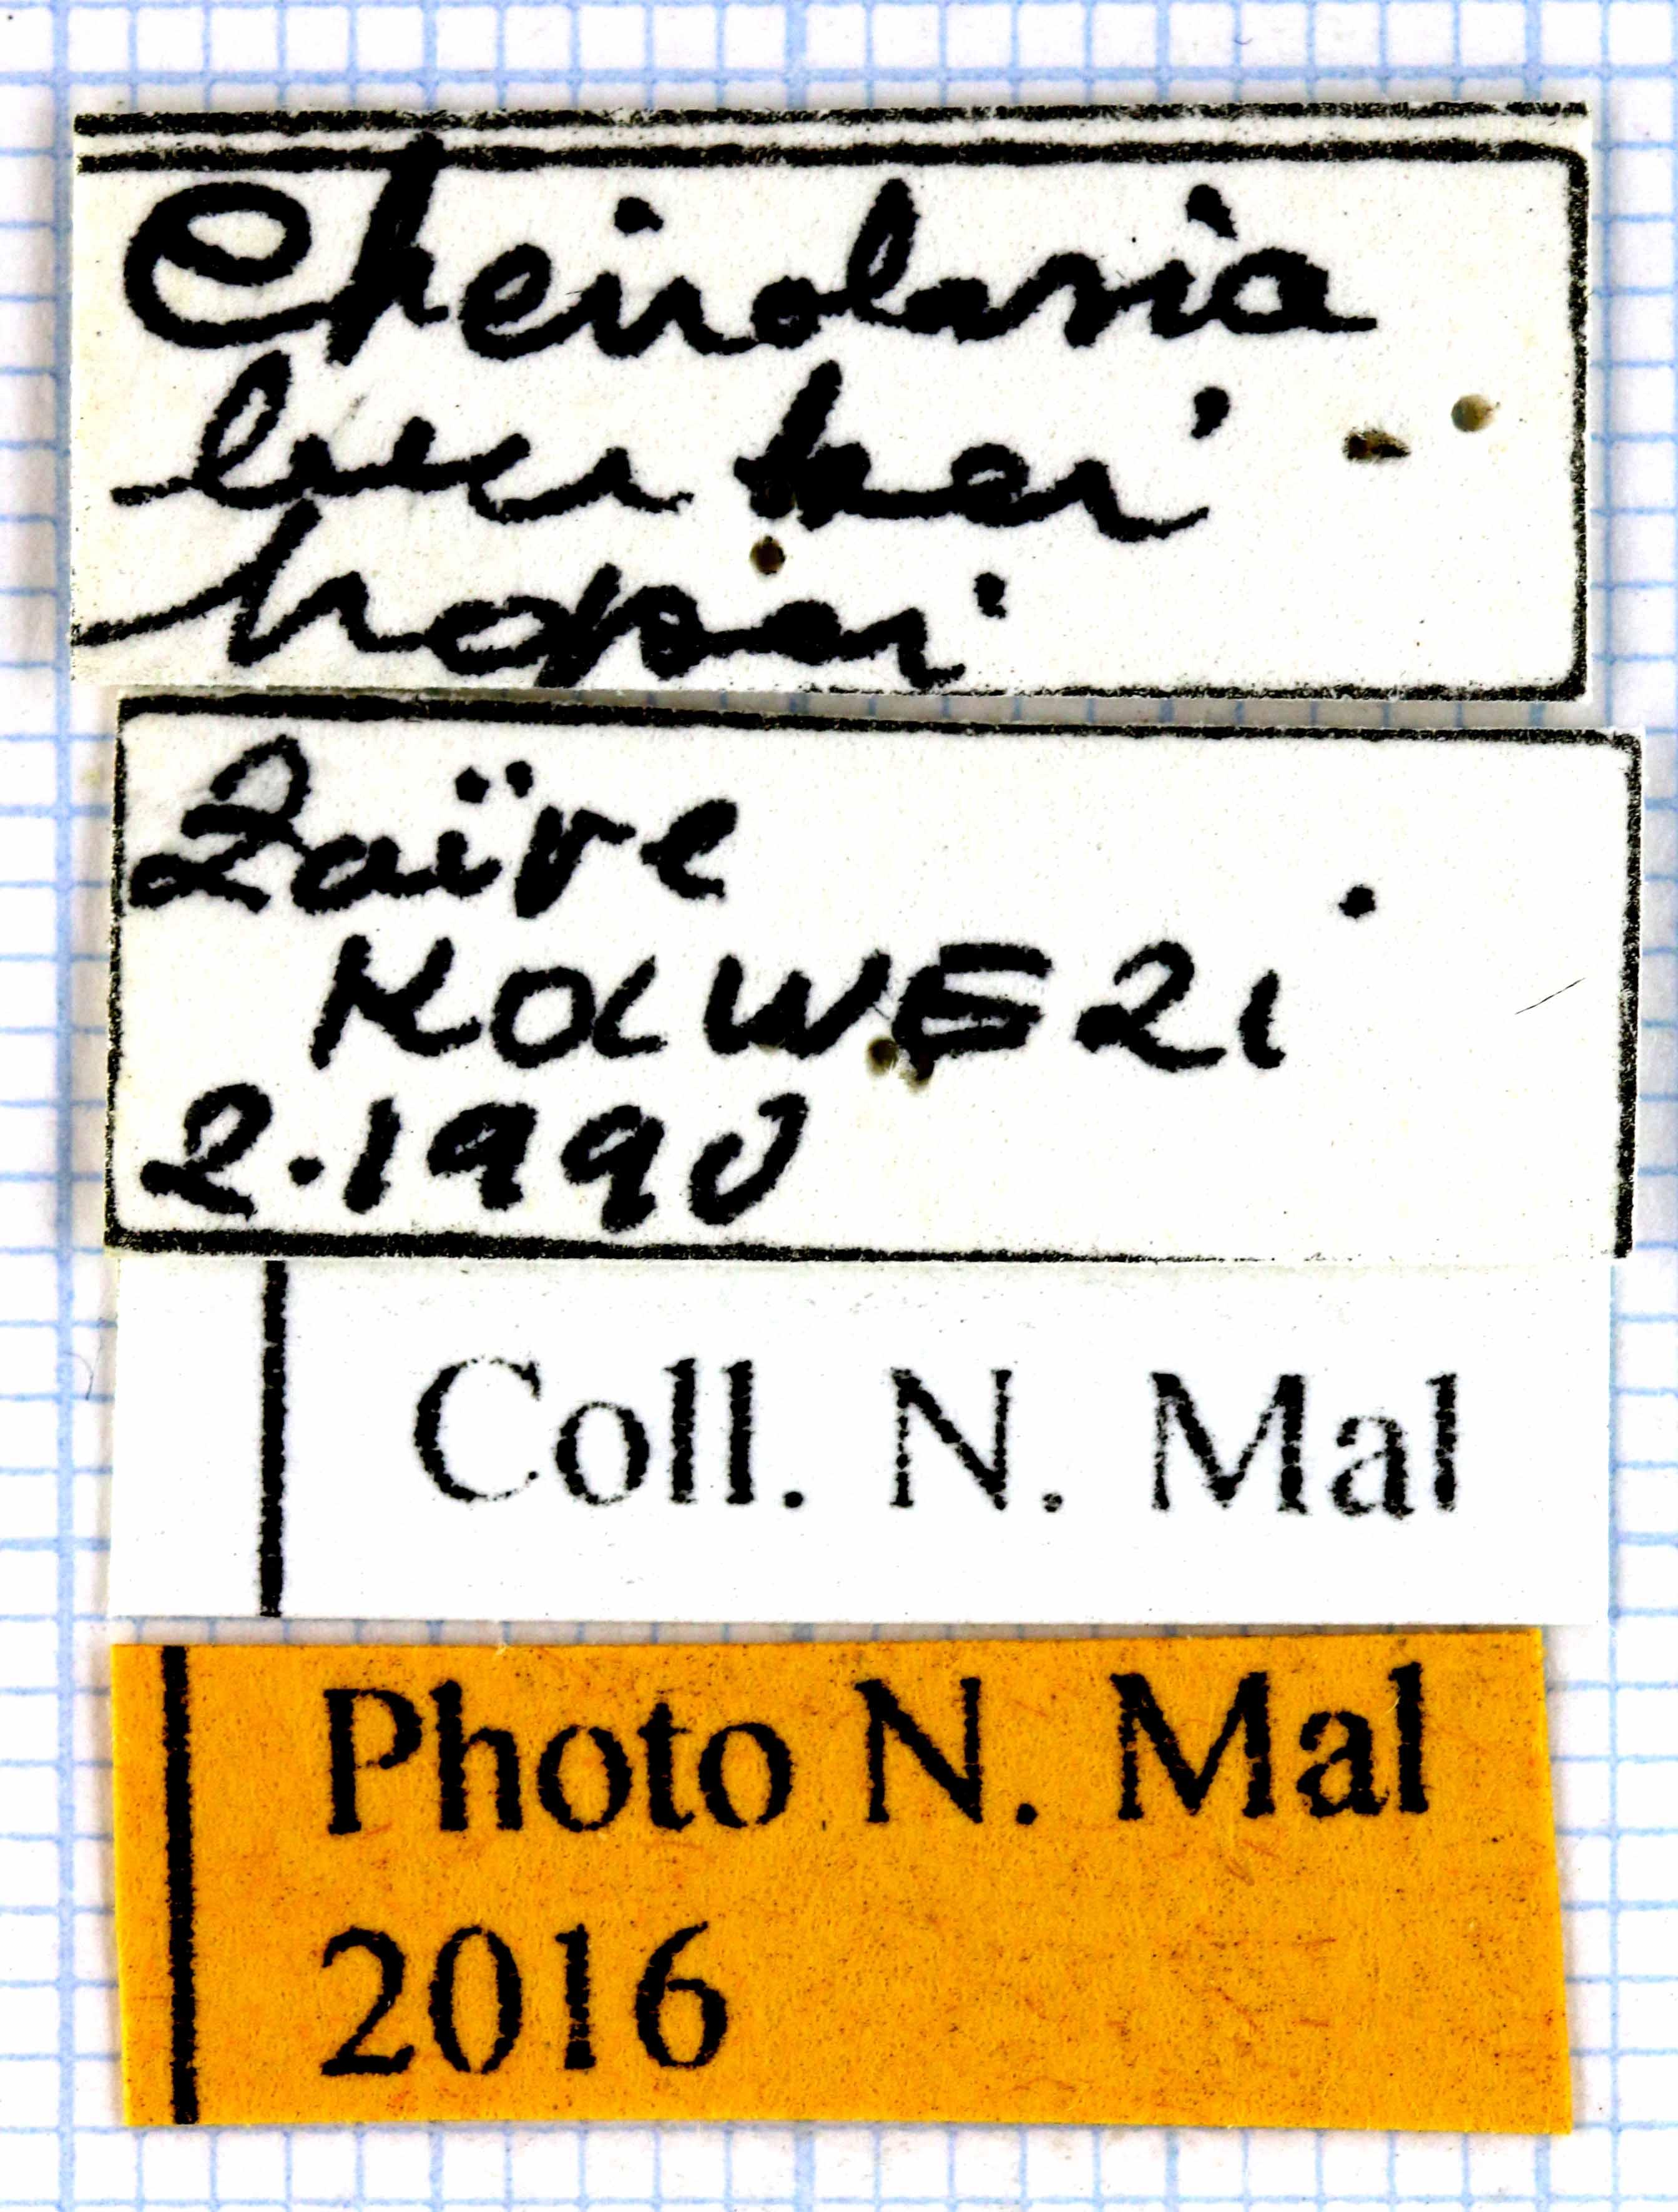 Cheirolasia burkei hopei 64122.jpg